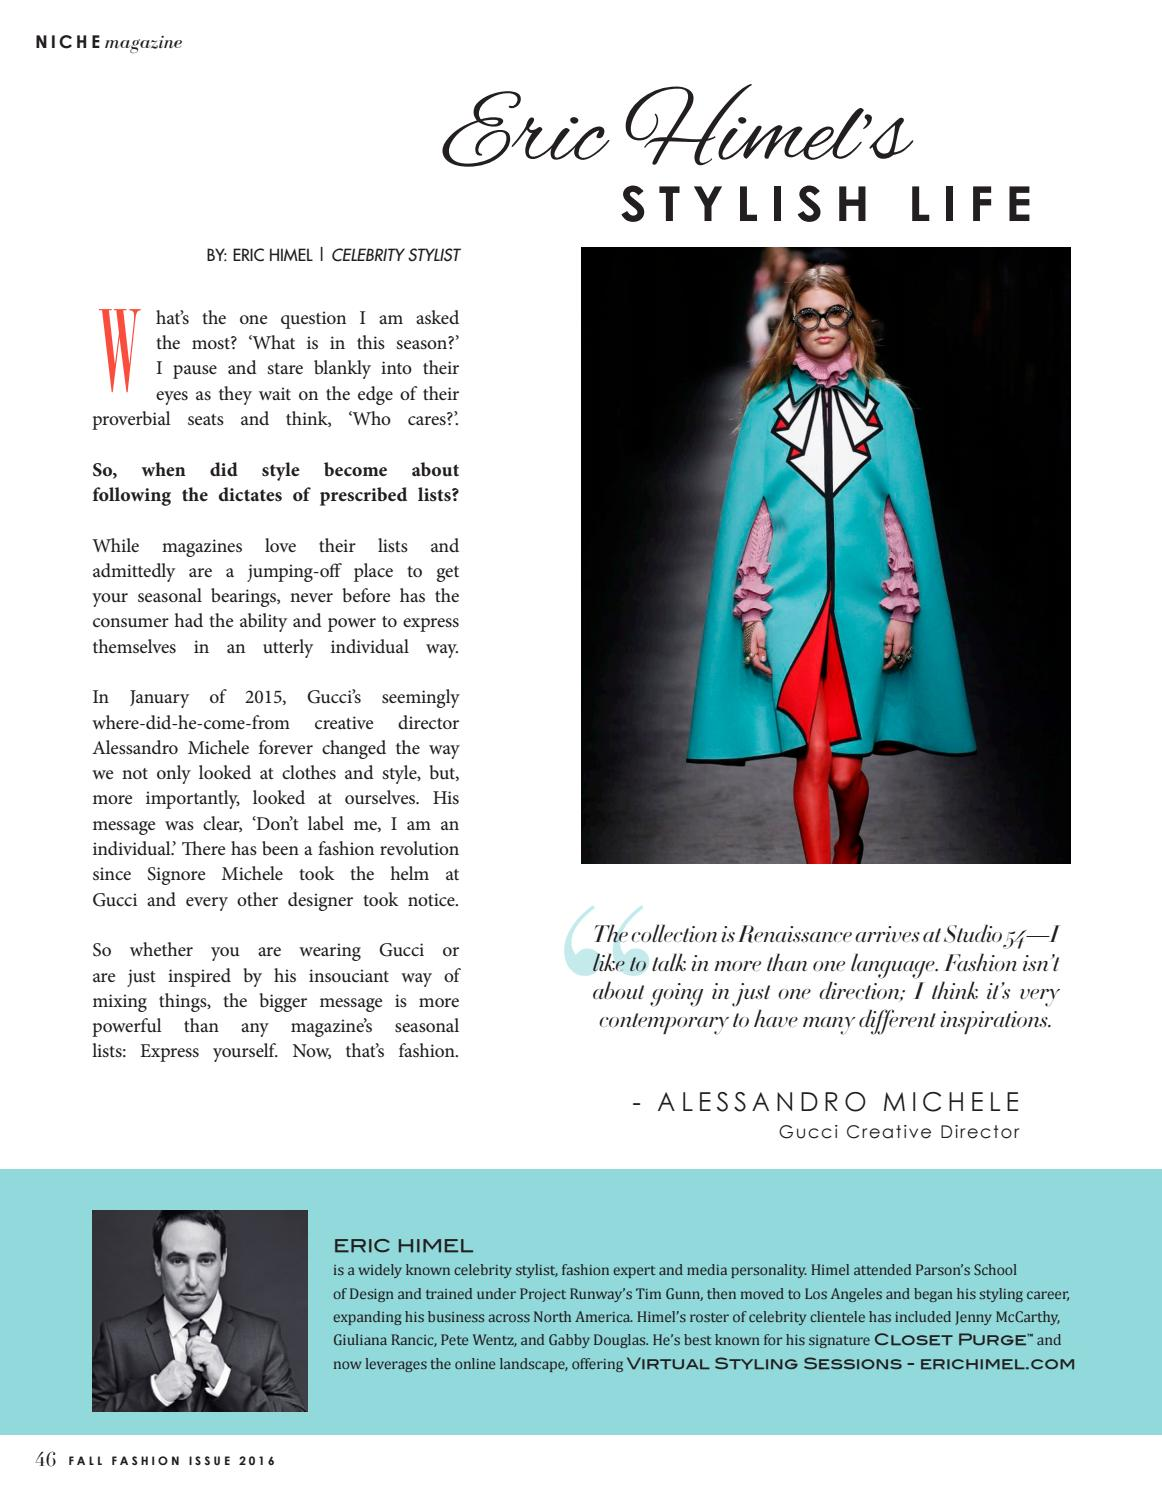 NICHE Fall Fashion Issue 2016 by NICHE magazine - issuu